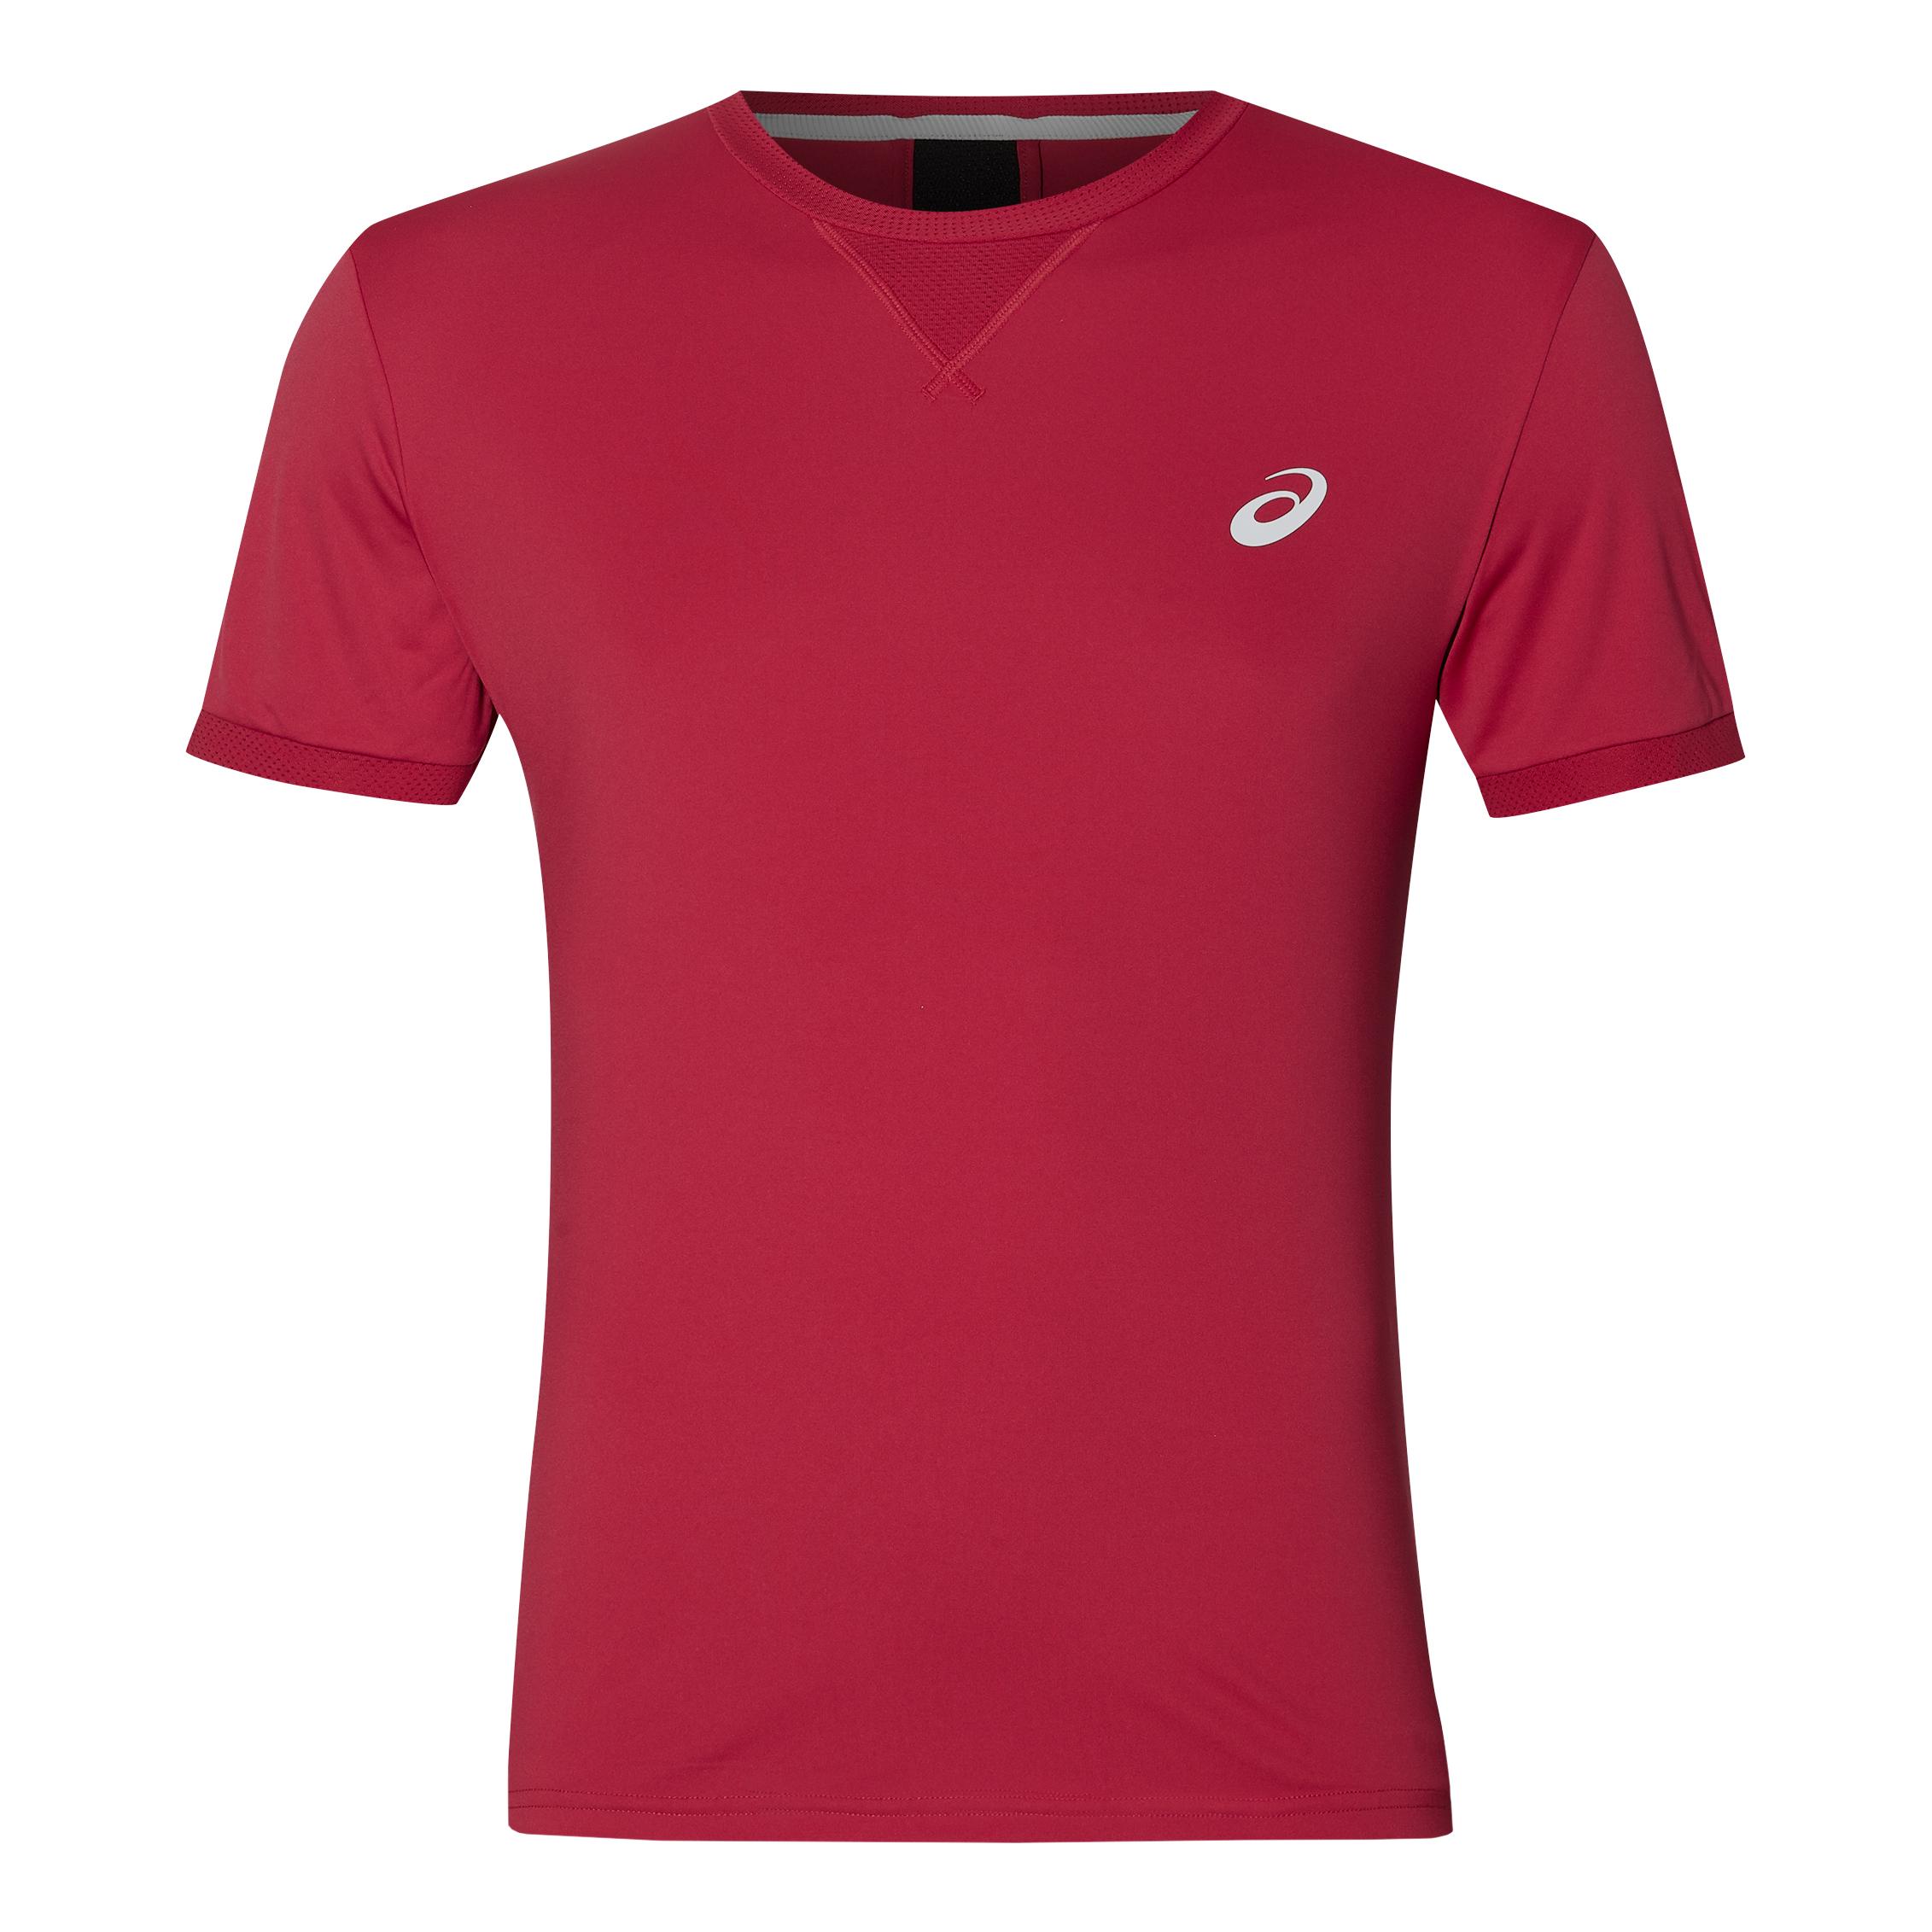 ASICS ASICS ASICS Uomo Shortsleeve Top T-Shirt Rosso Nuovo fb9a8c